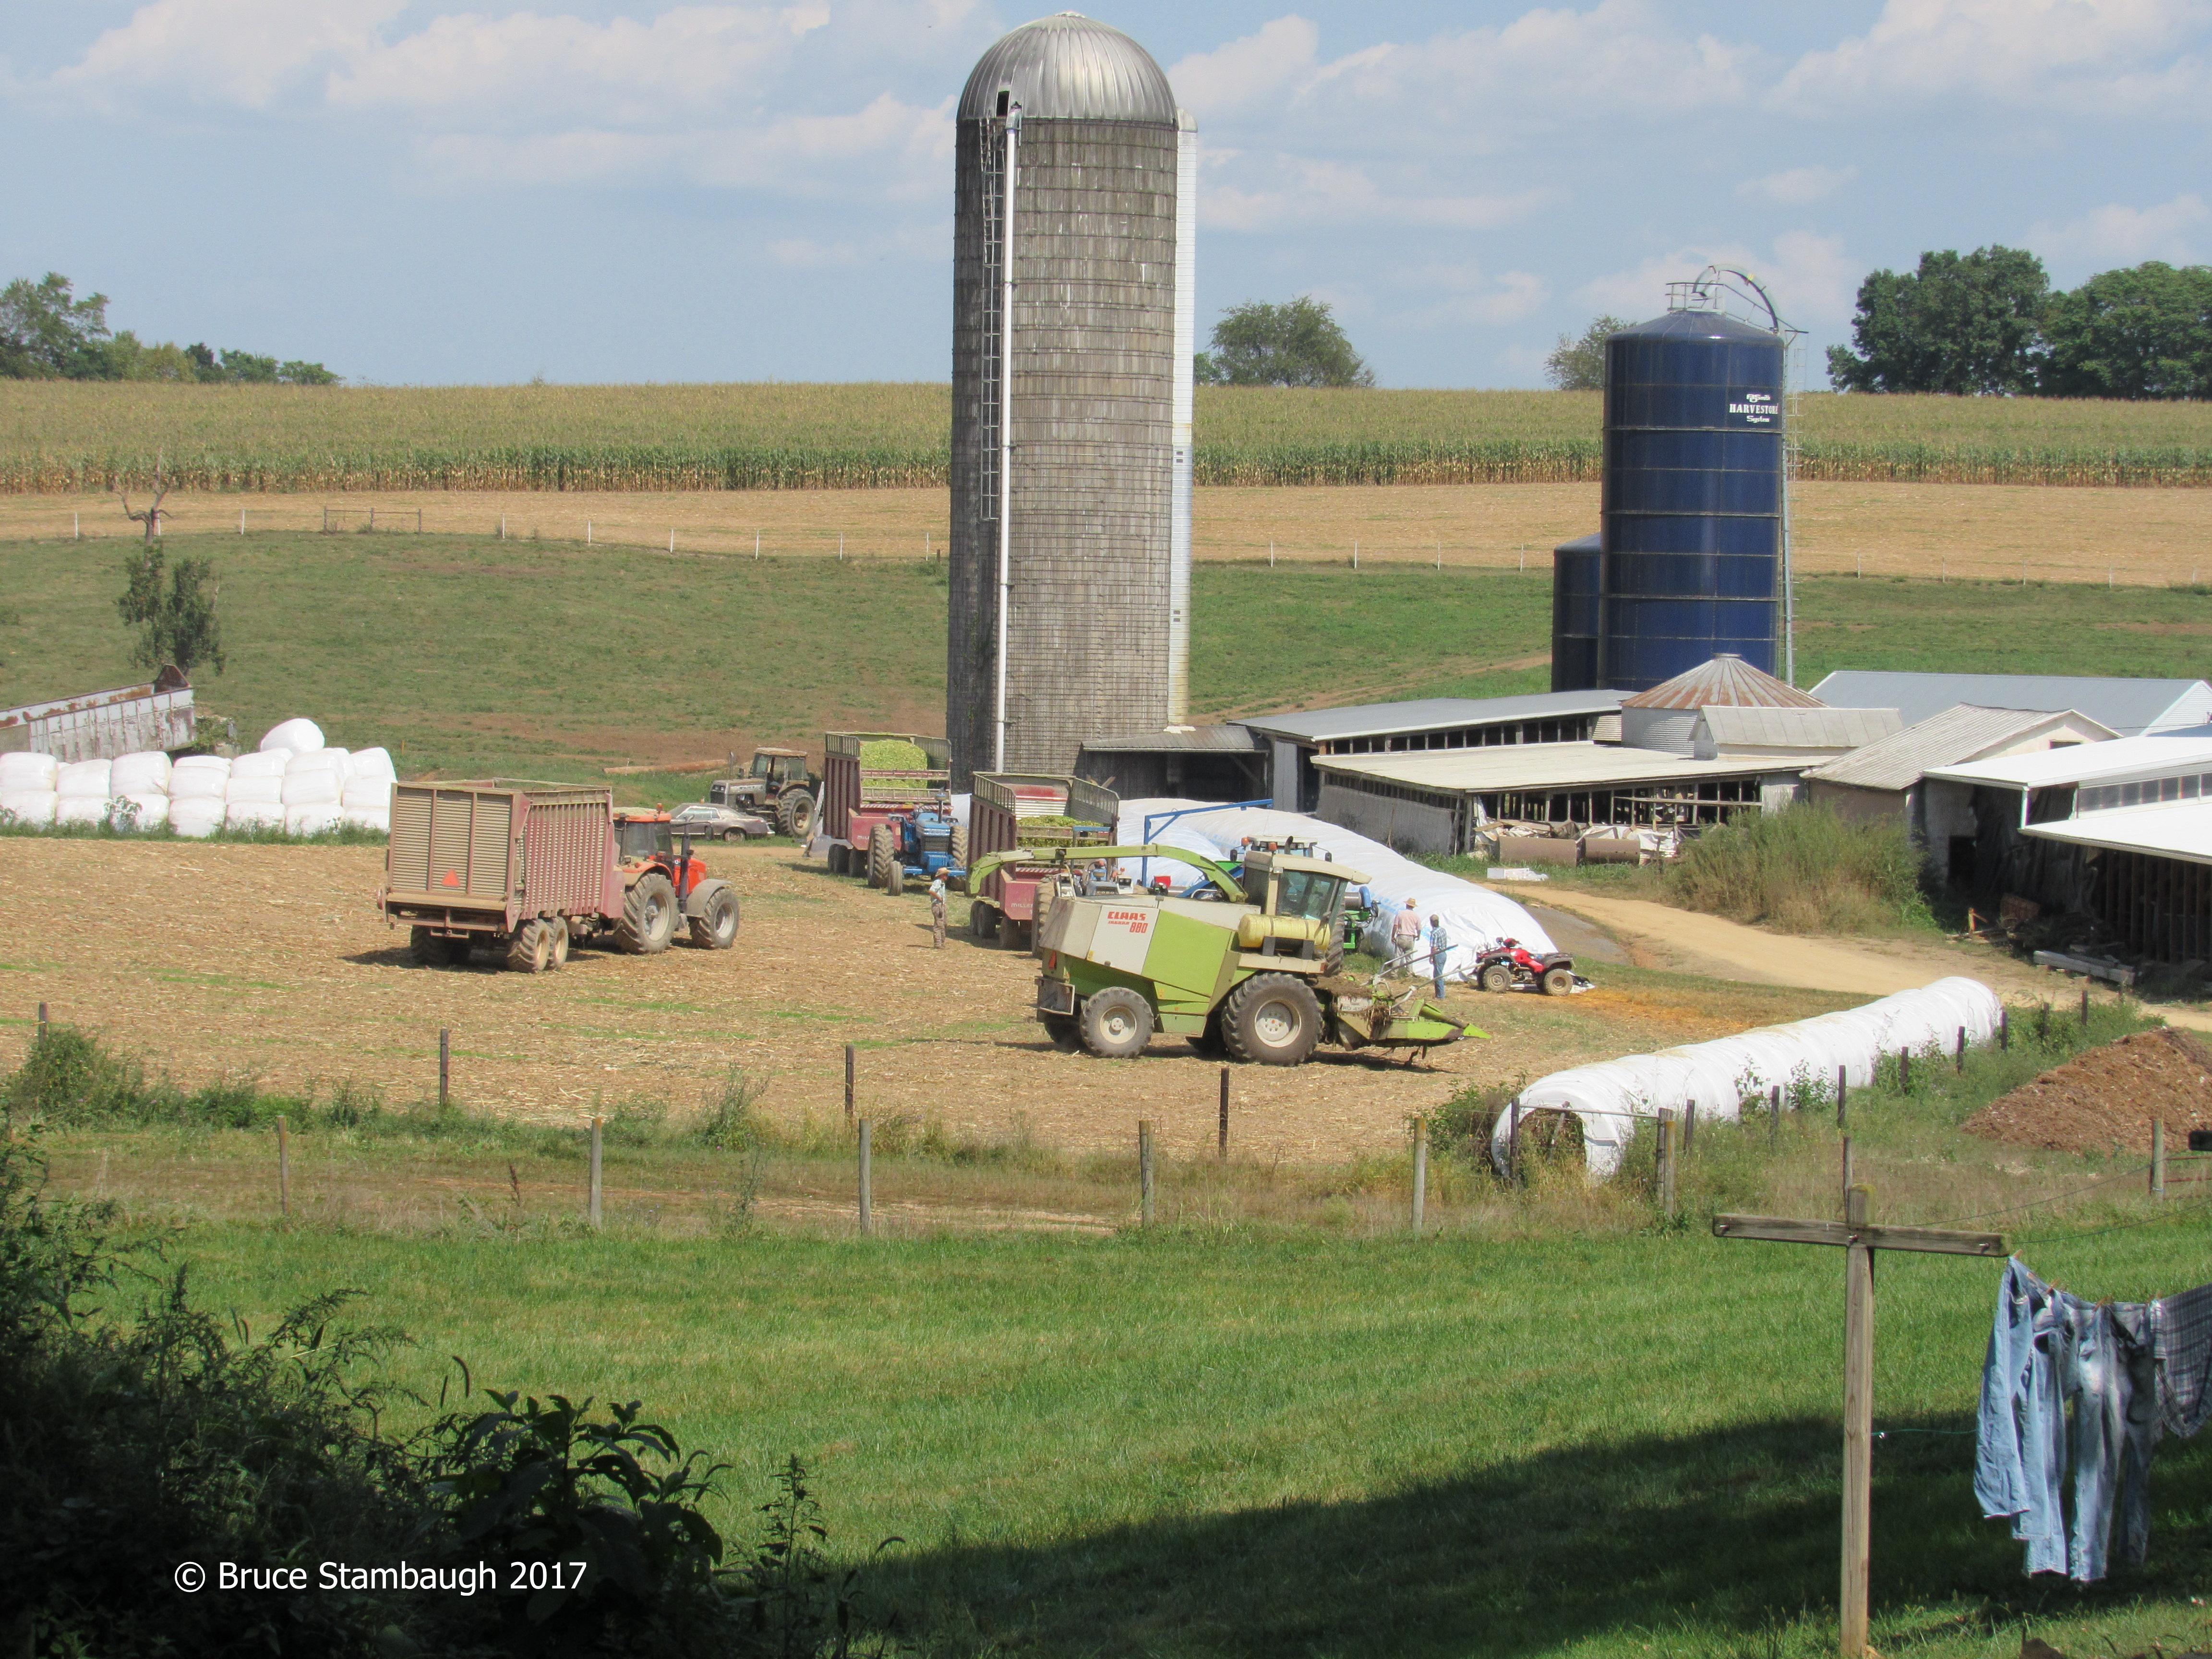 Shenandoah Valley farm, large farm equipment